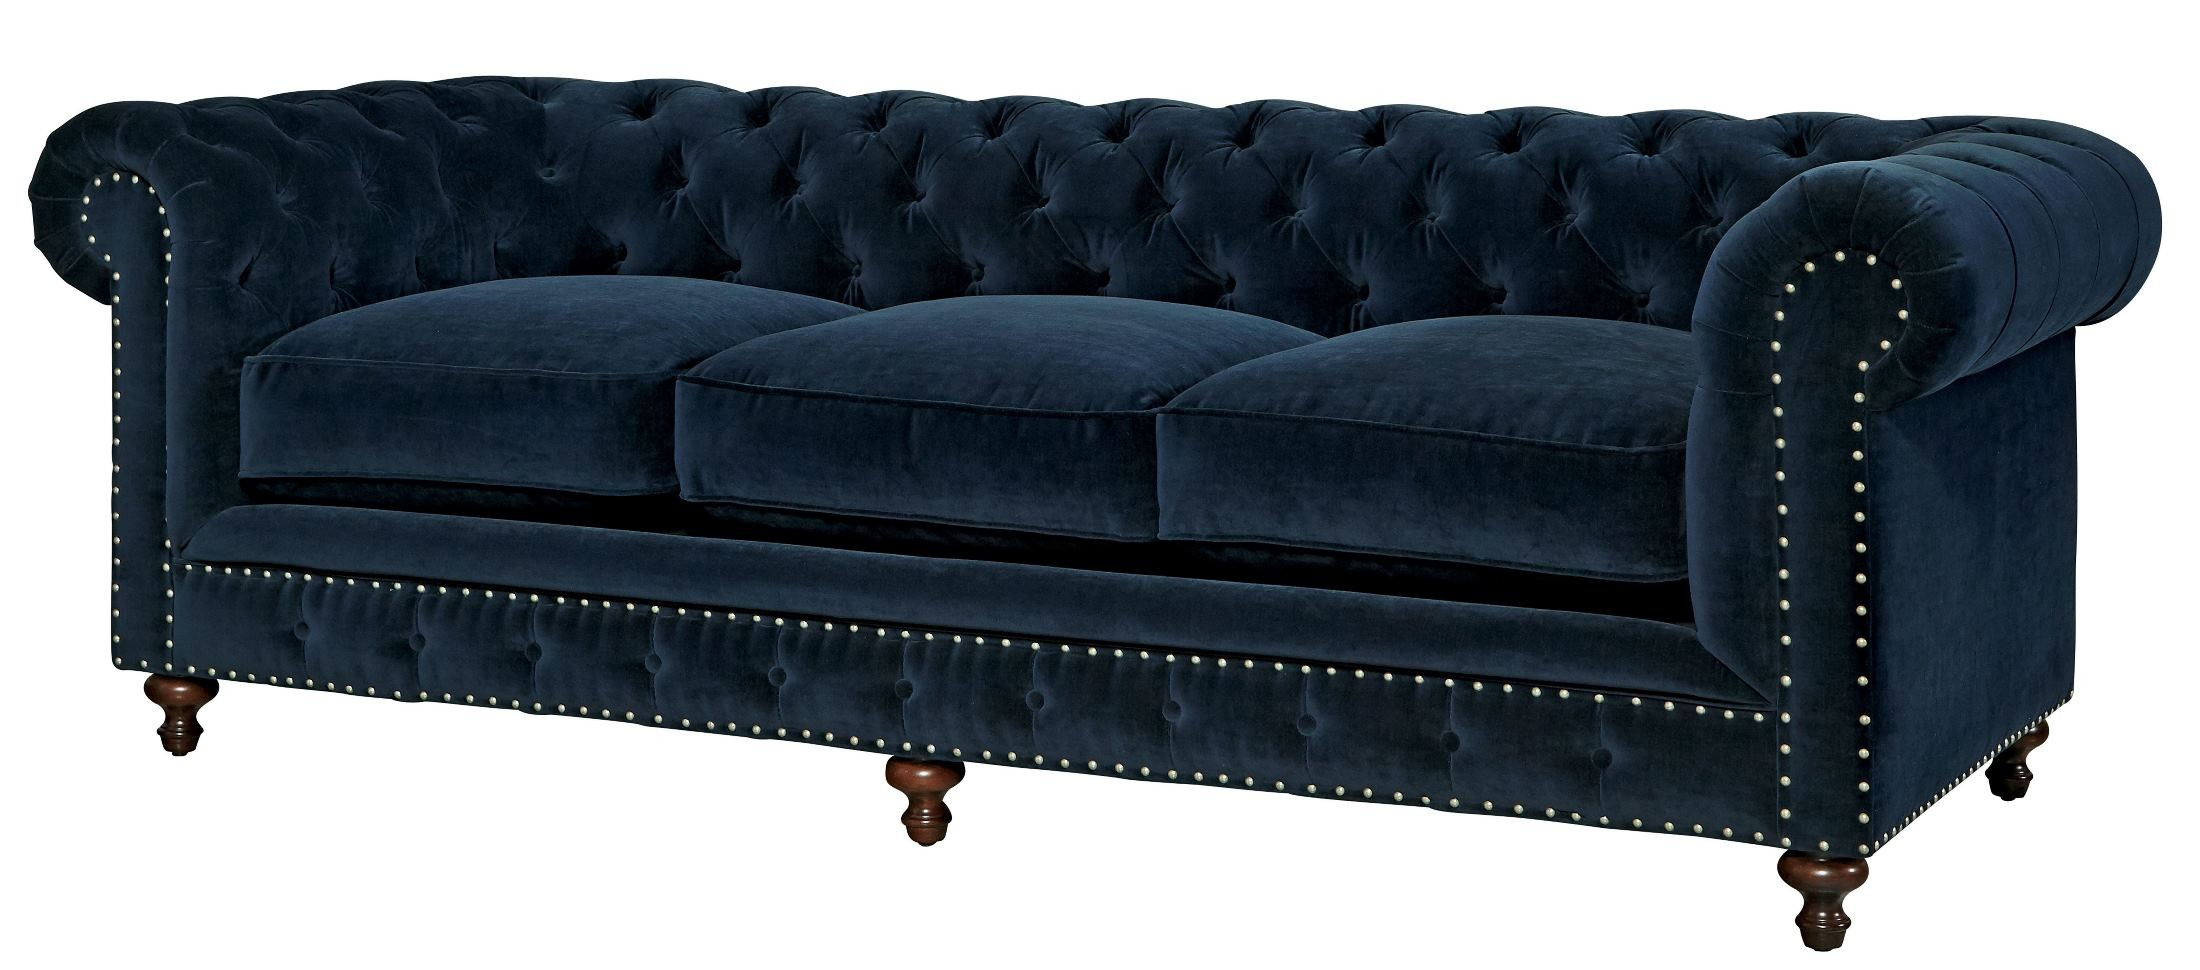 Smashing Berkeley Sumatra Blue Velvet Sofa From Universal Coleman Furniture Blue Velvet Couch West Elm Blue Velvet Couch Cover houzz 01 Blue Velvet Couch